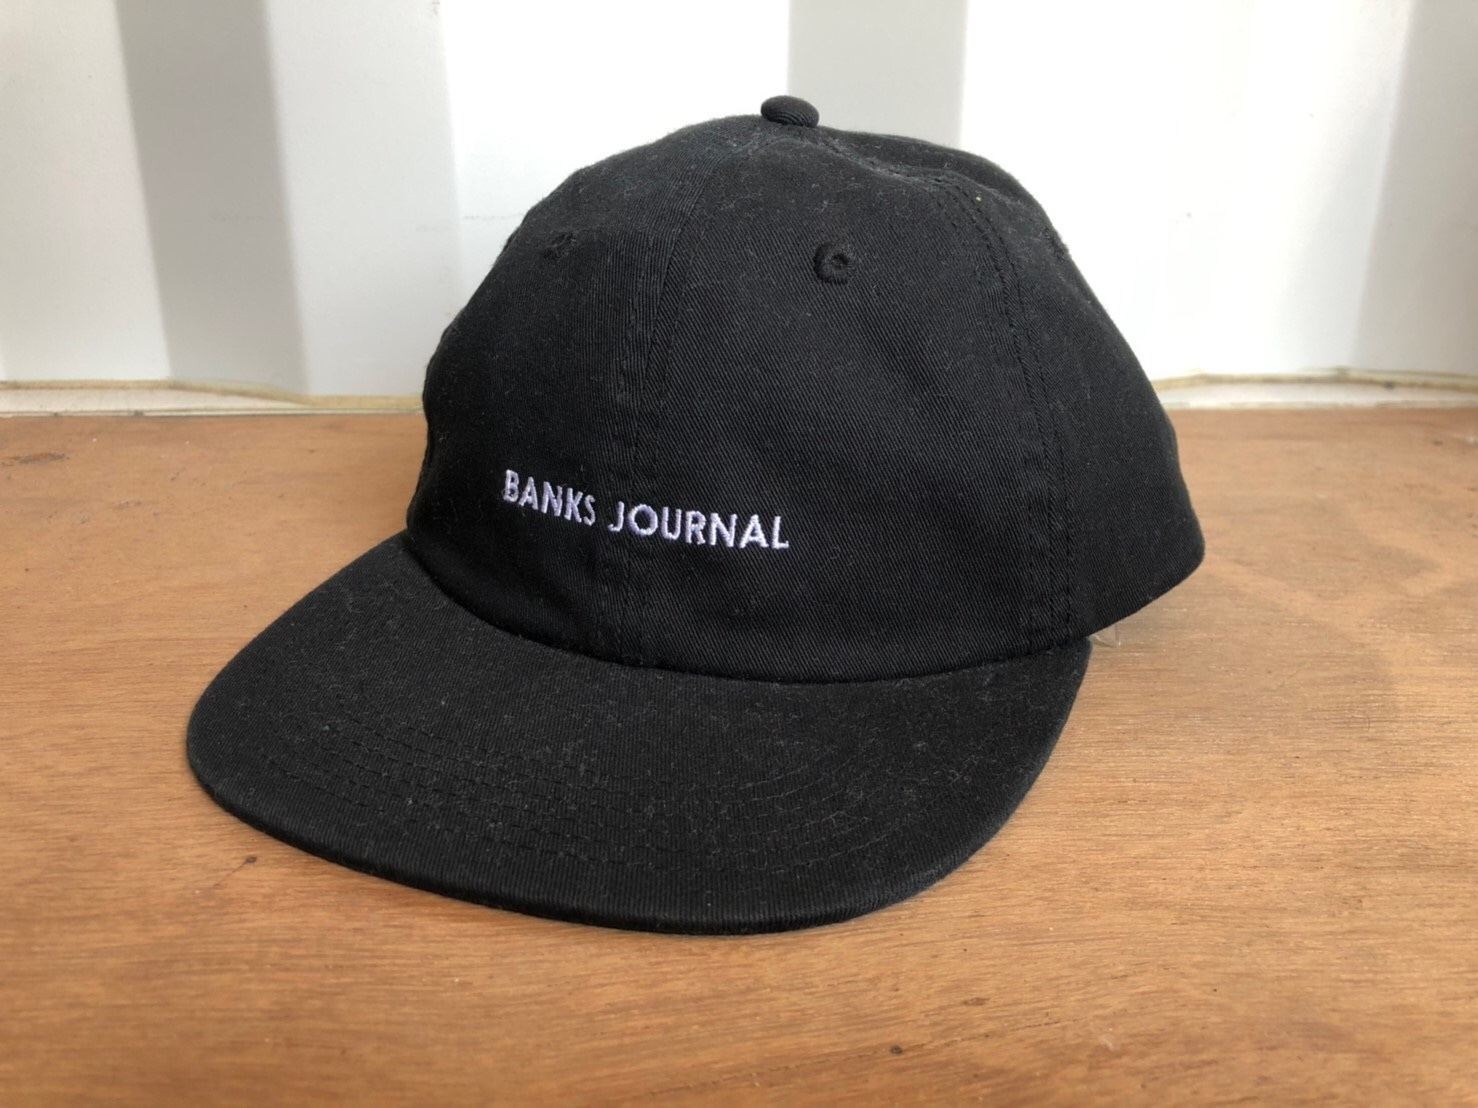 BANKS JOURNAL CAP (black)